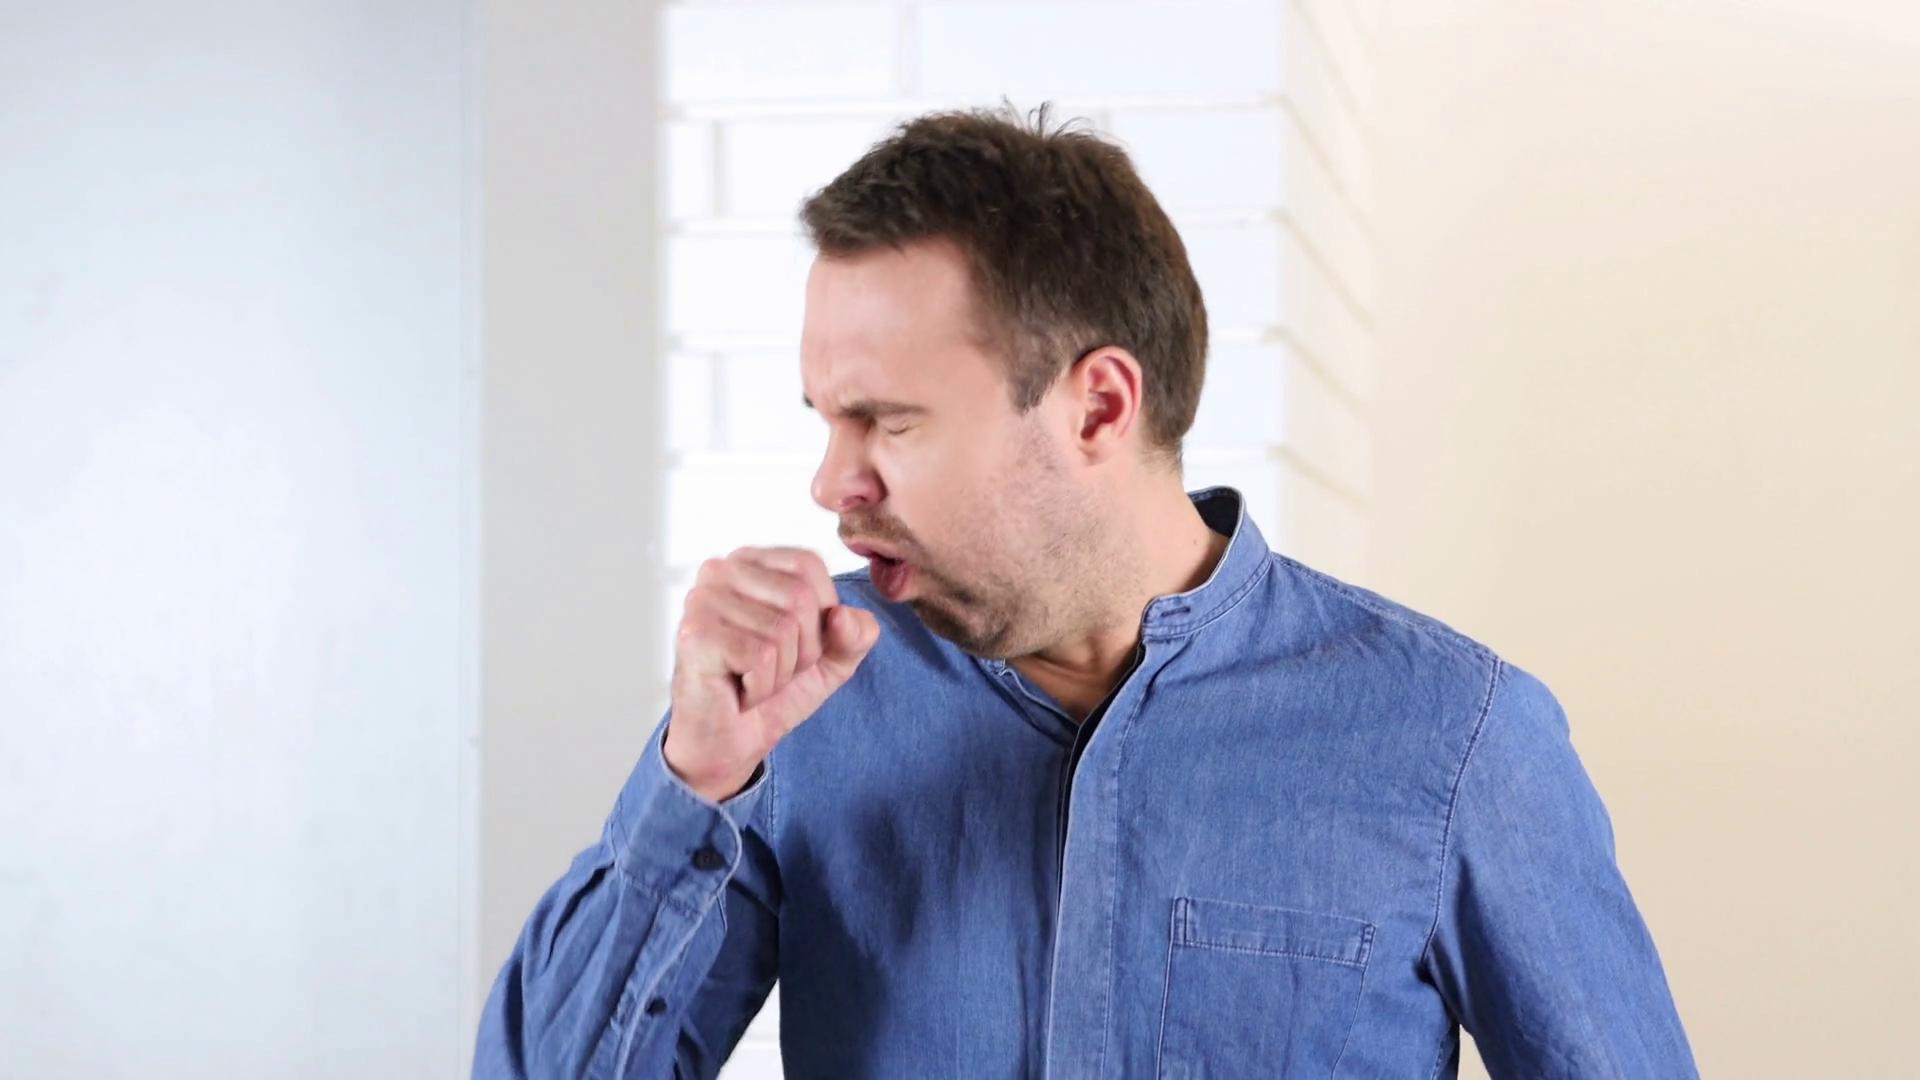 Penyakit Paru Obstruktif Kronis (PPOK), Waspada Sesak Progresif